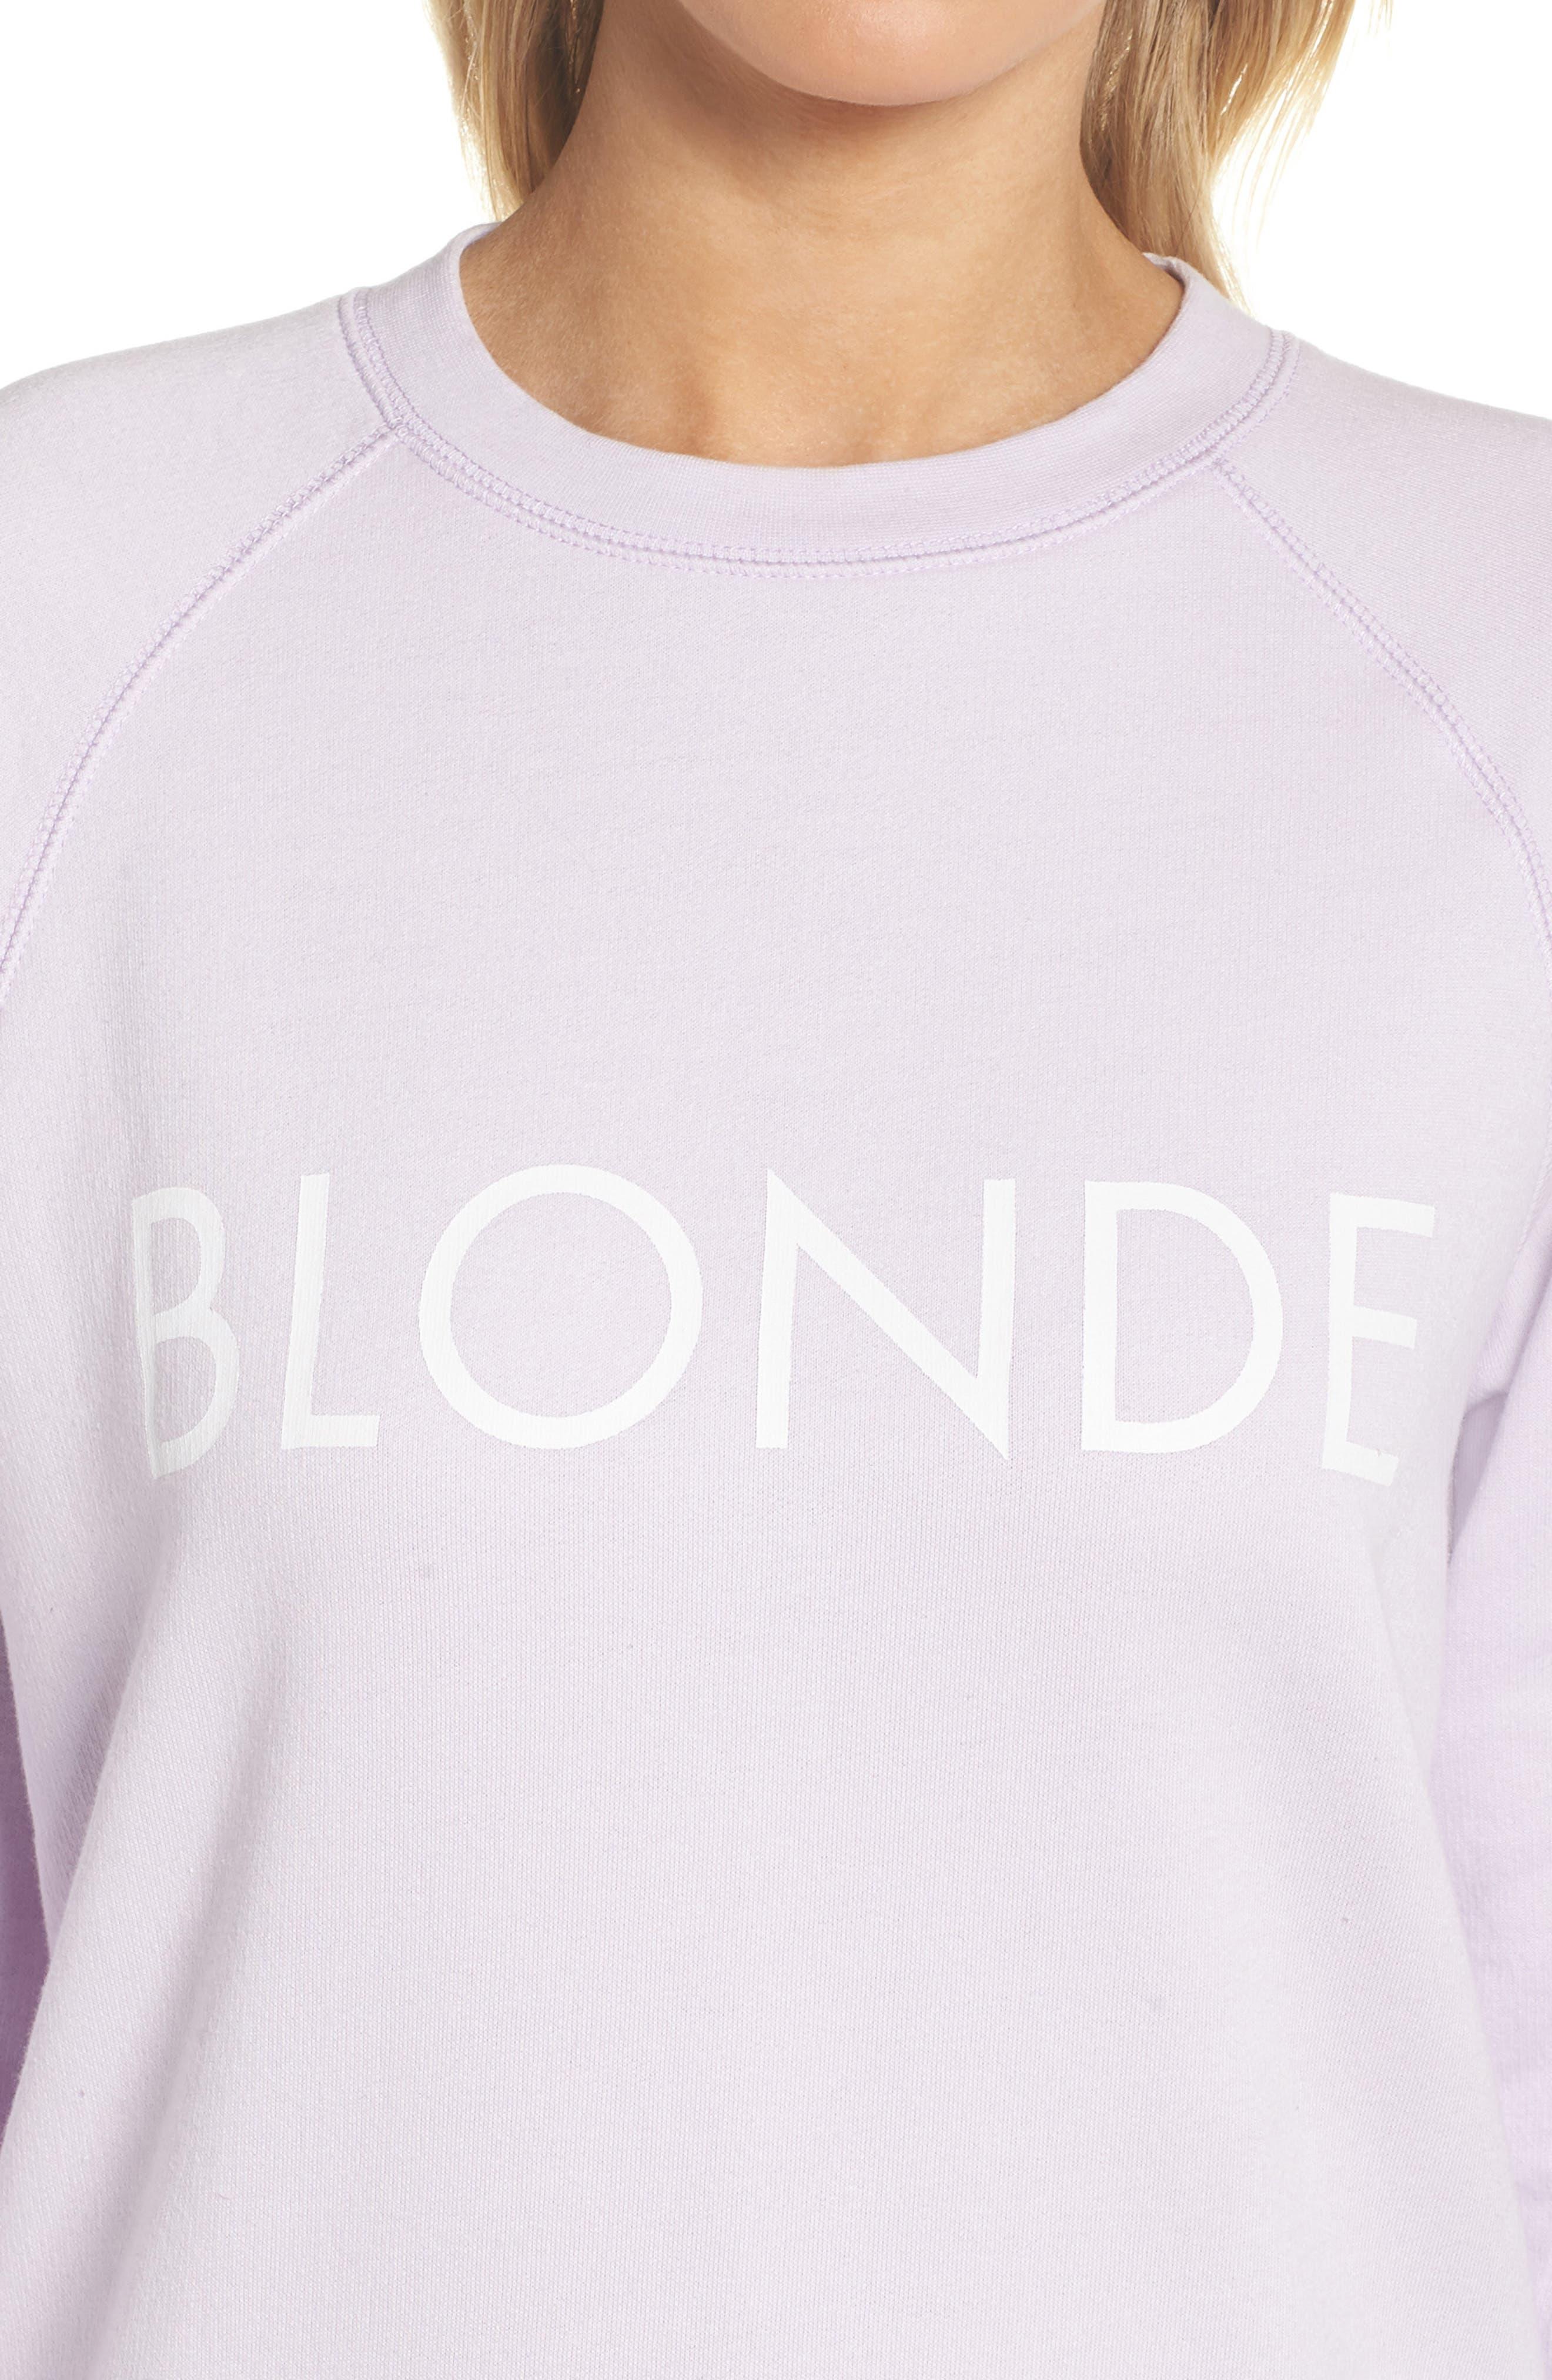 Blonde Sweatshirt,                             Alternate thumbnail 4, color,                             Soft Lavender